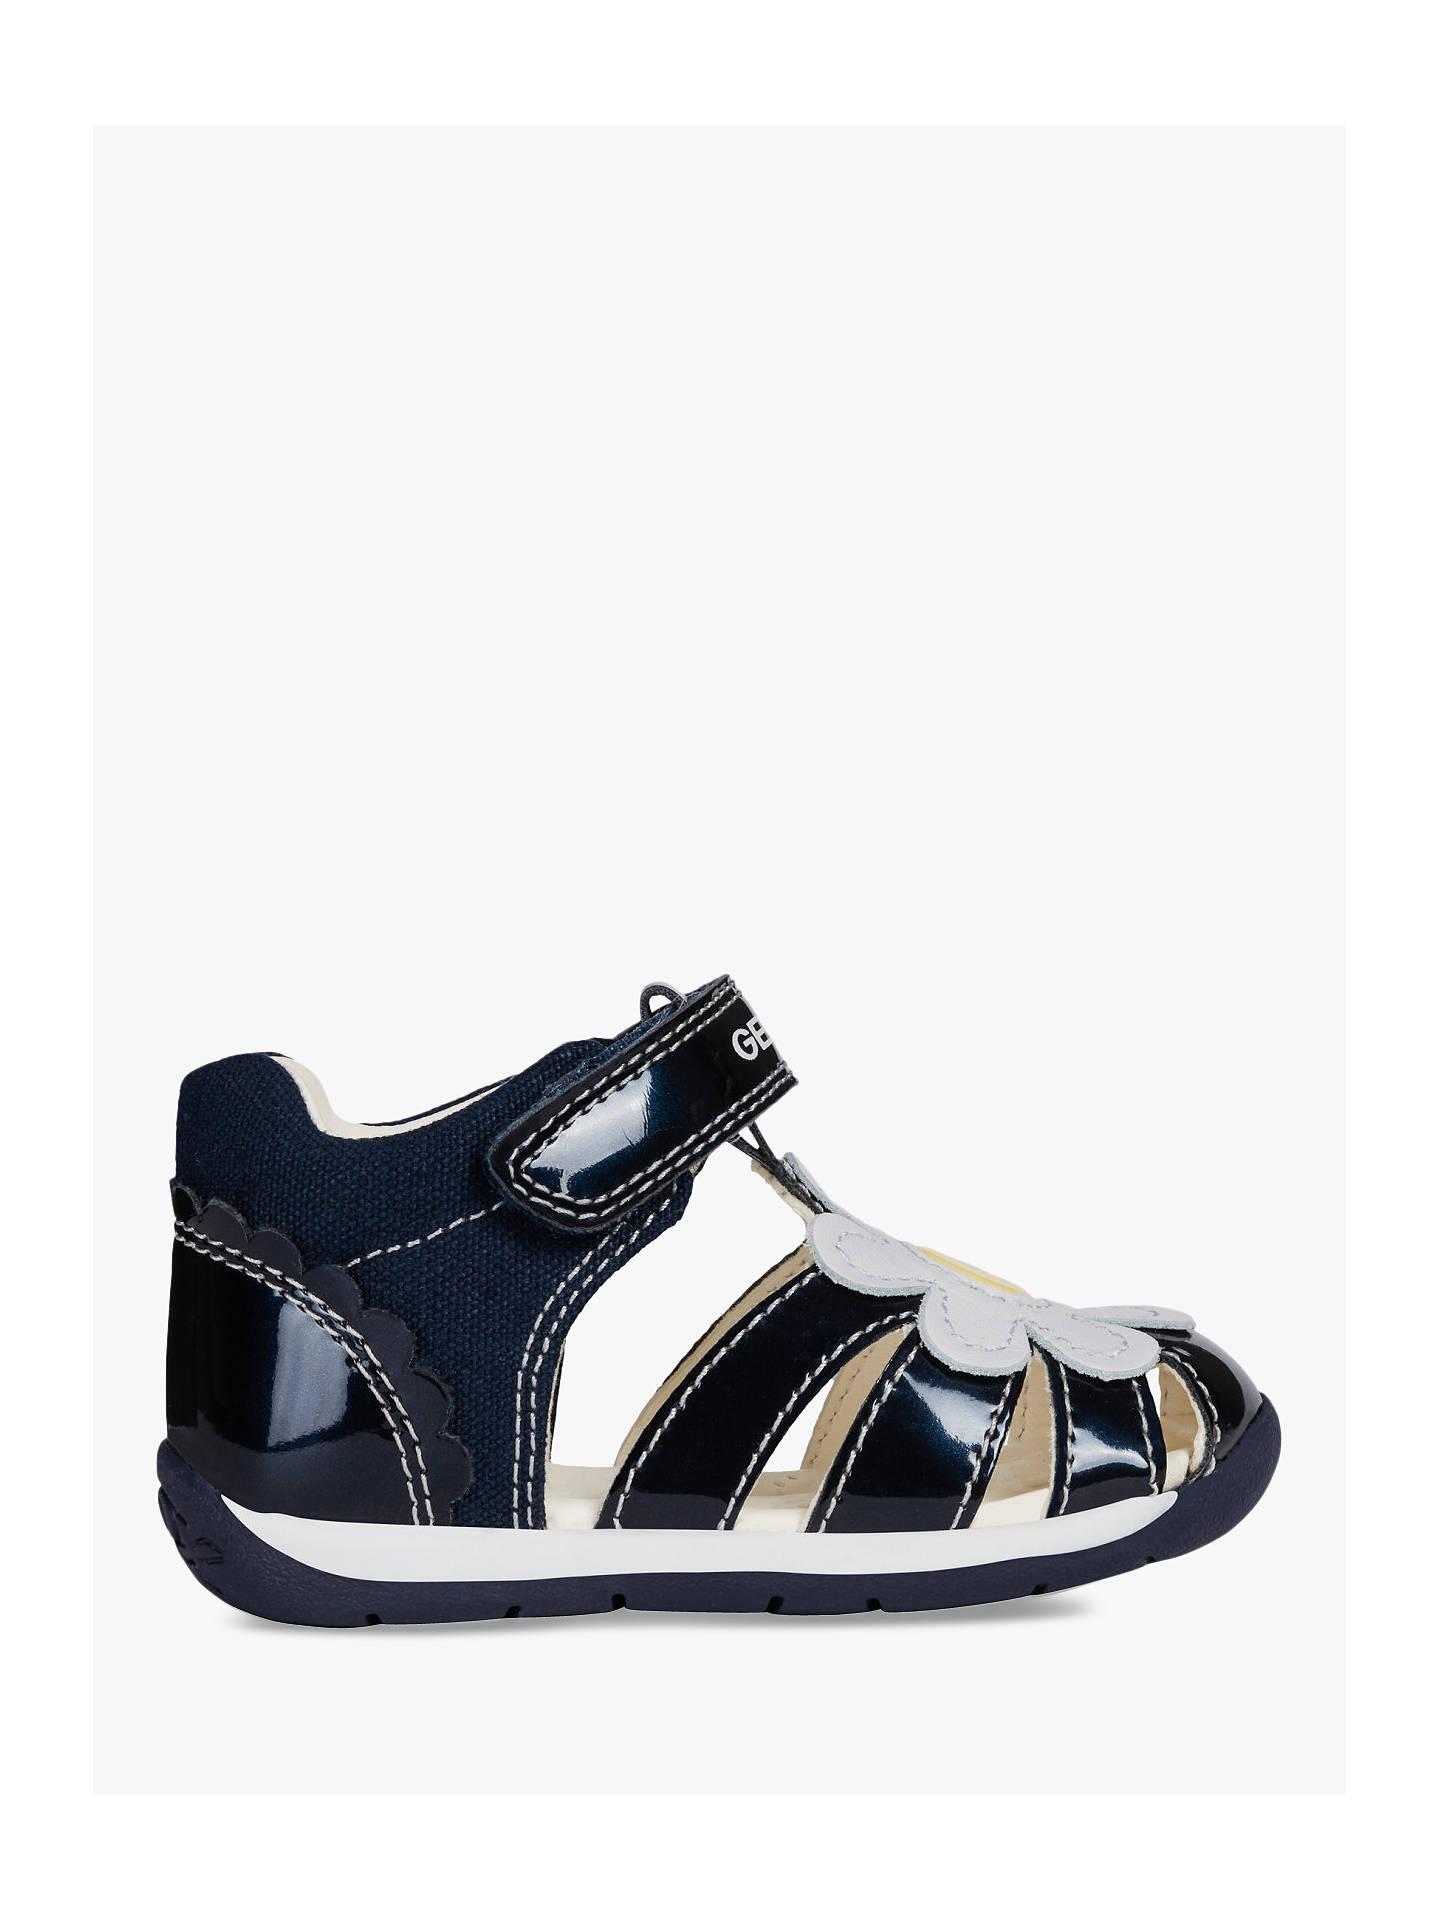 a05a629a4f39 Geox Children's Each G Riptape Sandals, Navy/White